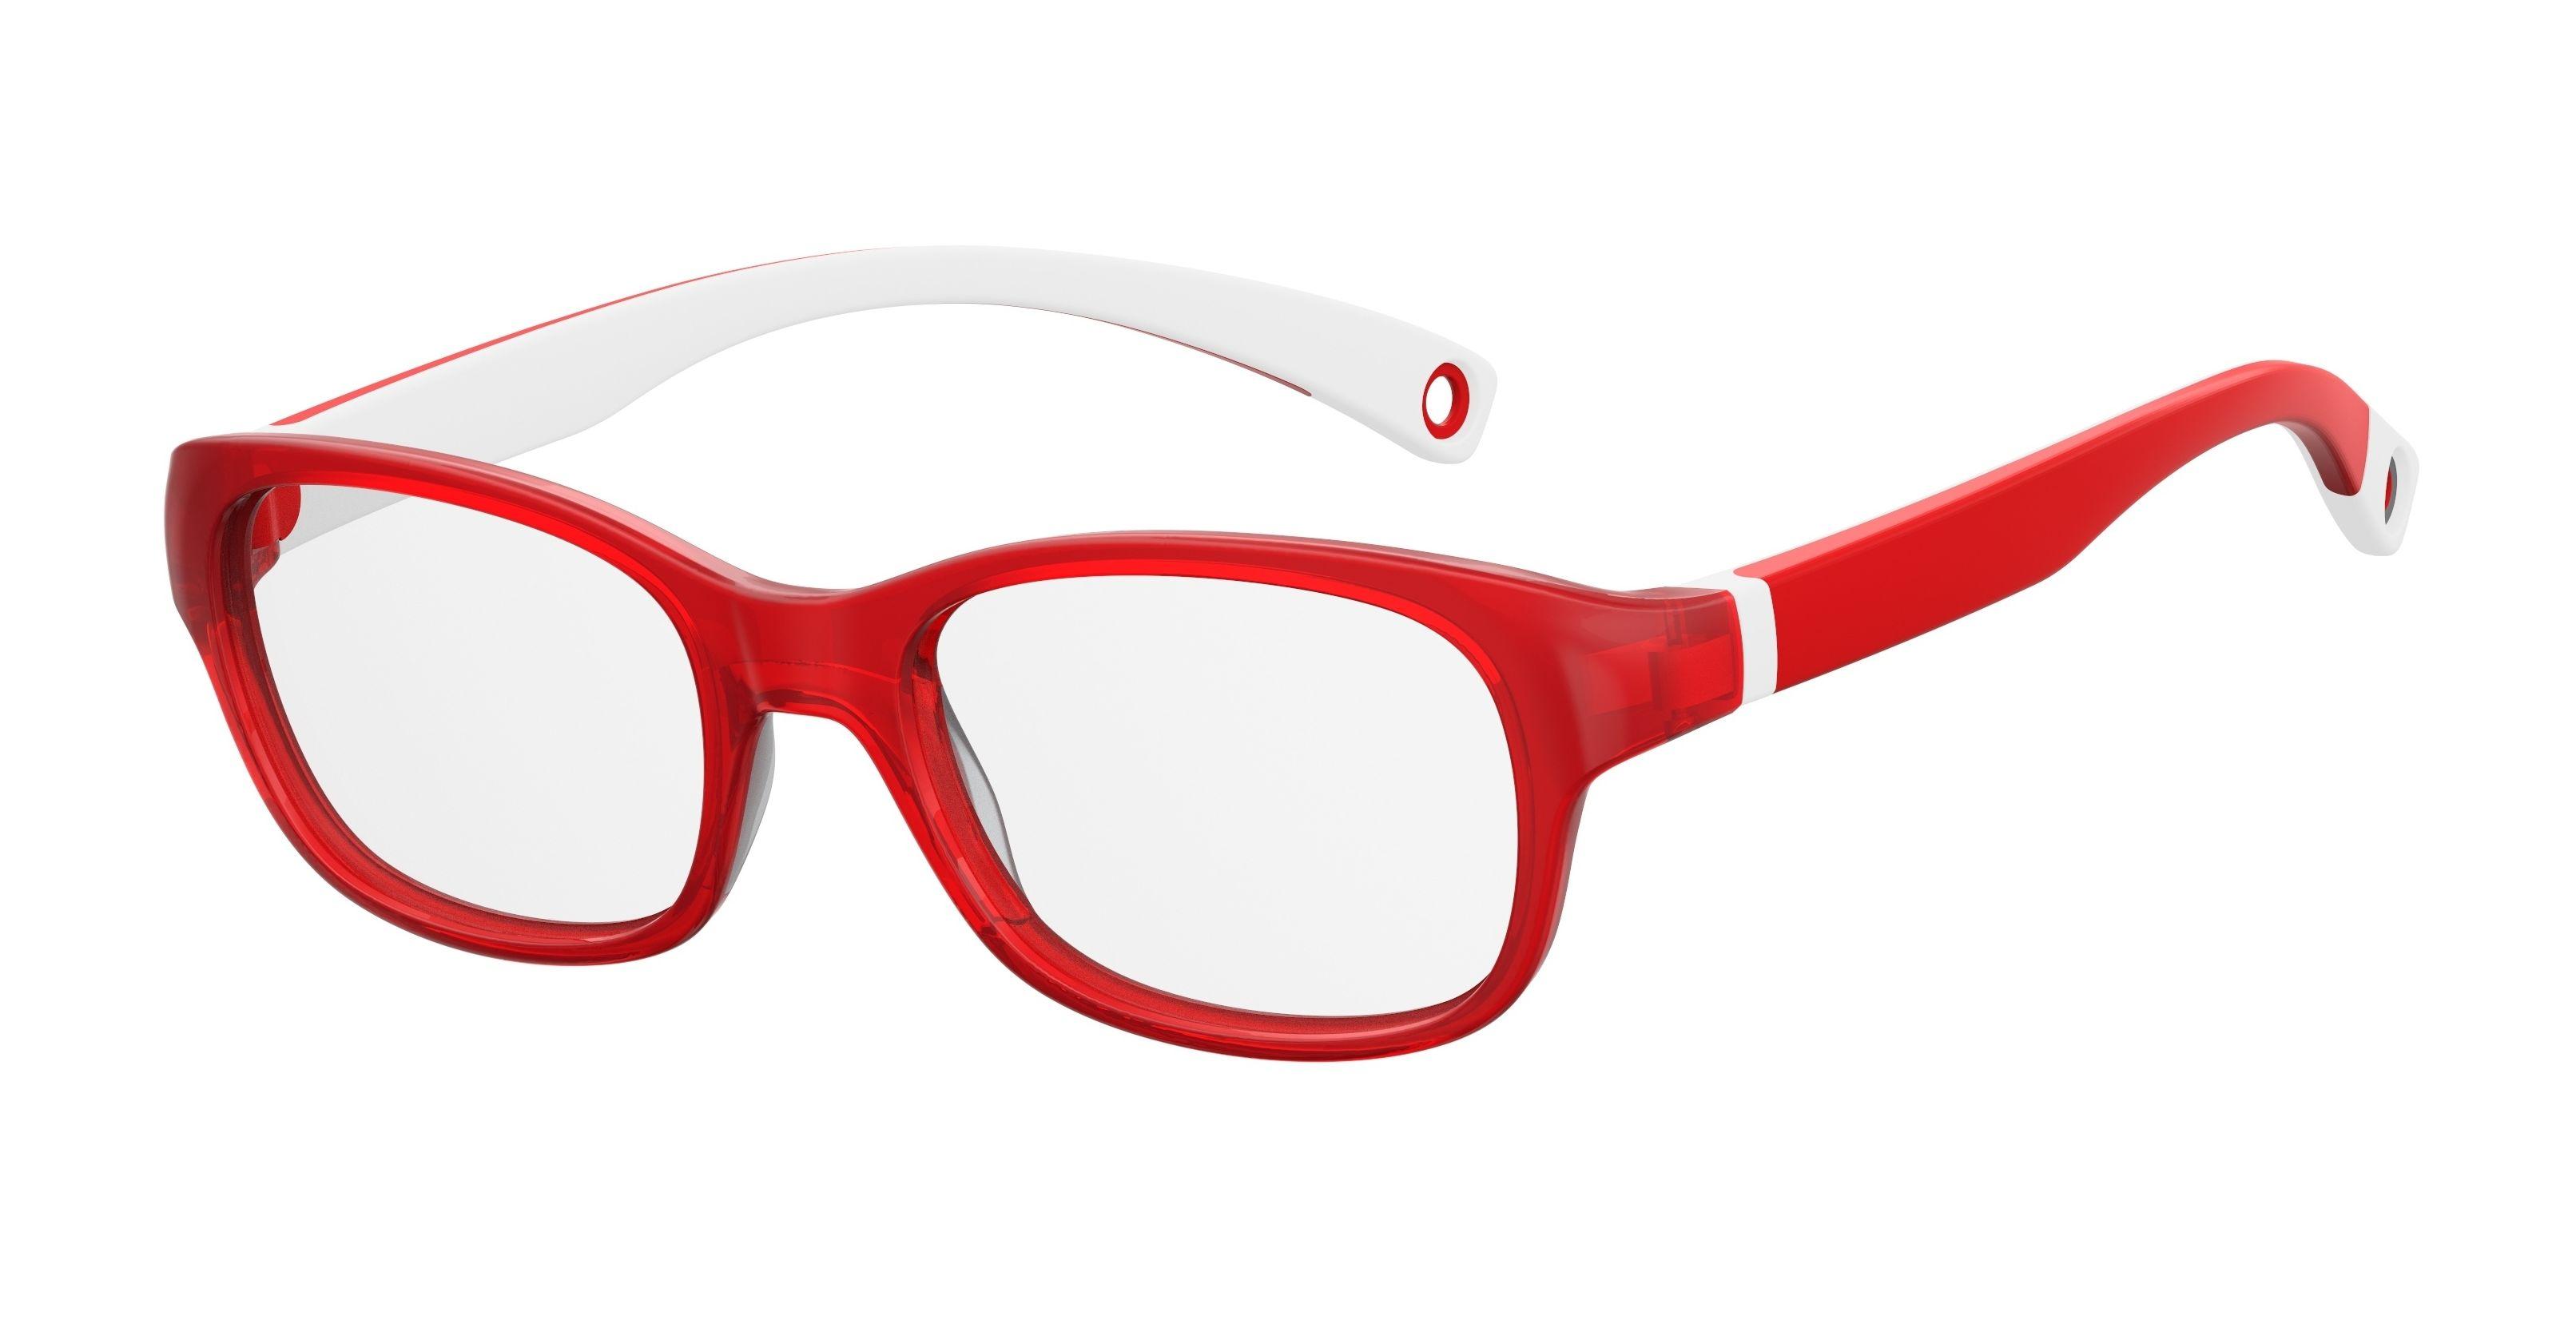 e81a2678f2 Eyewear for Kids - Boy White 6-8 years - Optiwow